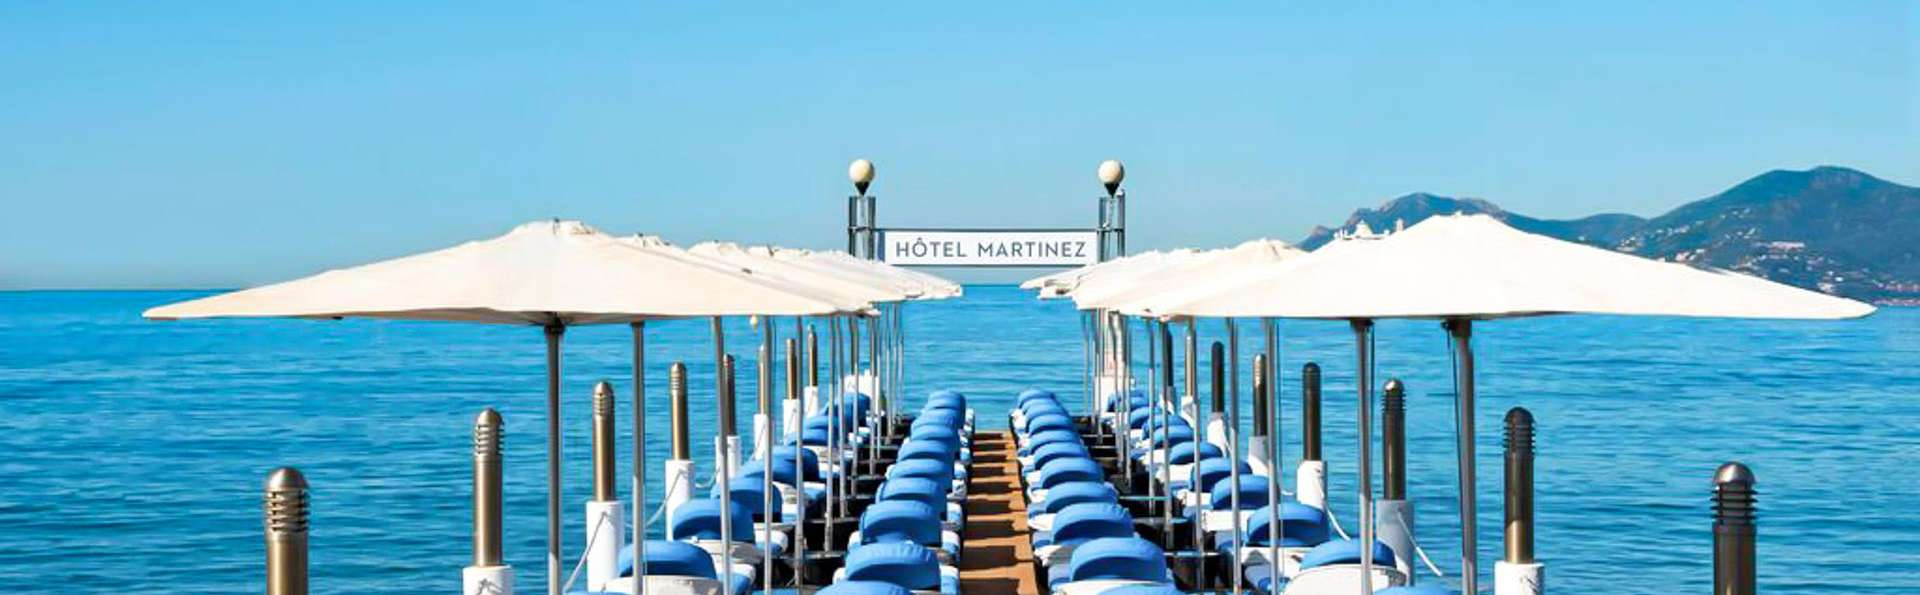 Hotel Martinez - EDIT_WEB_EXTERIOR_02.jpg